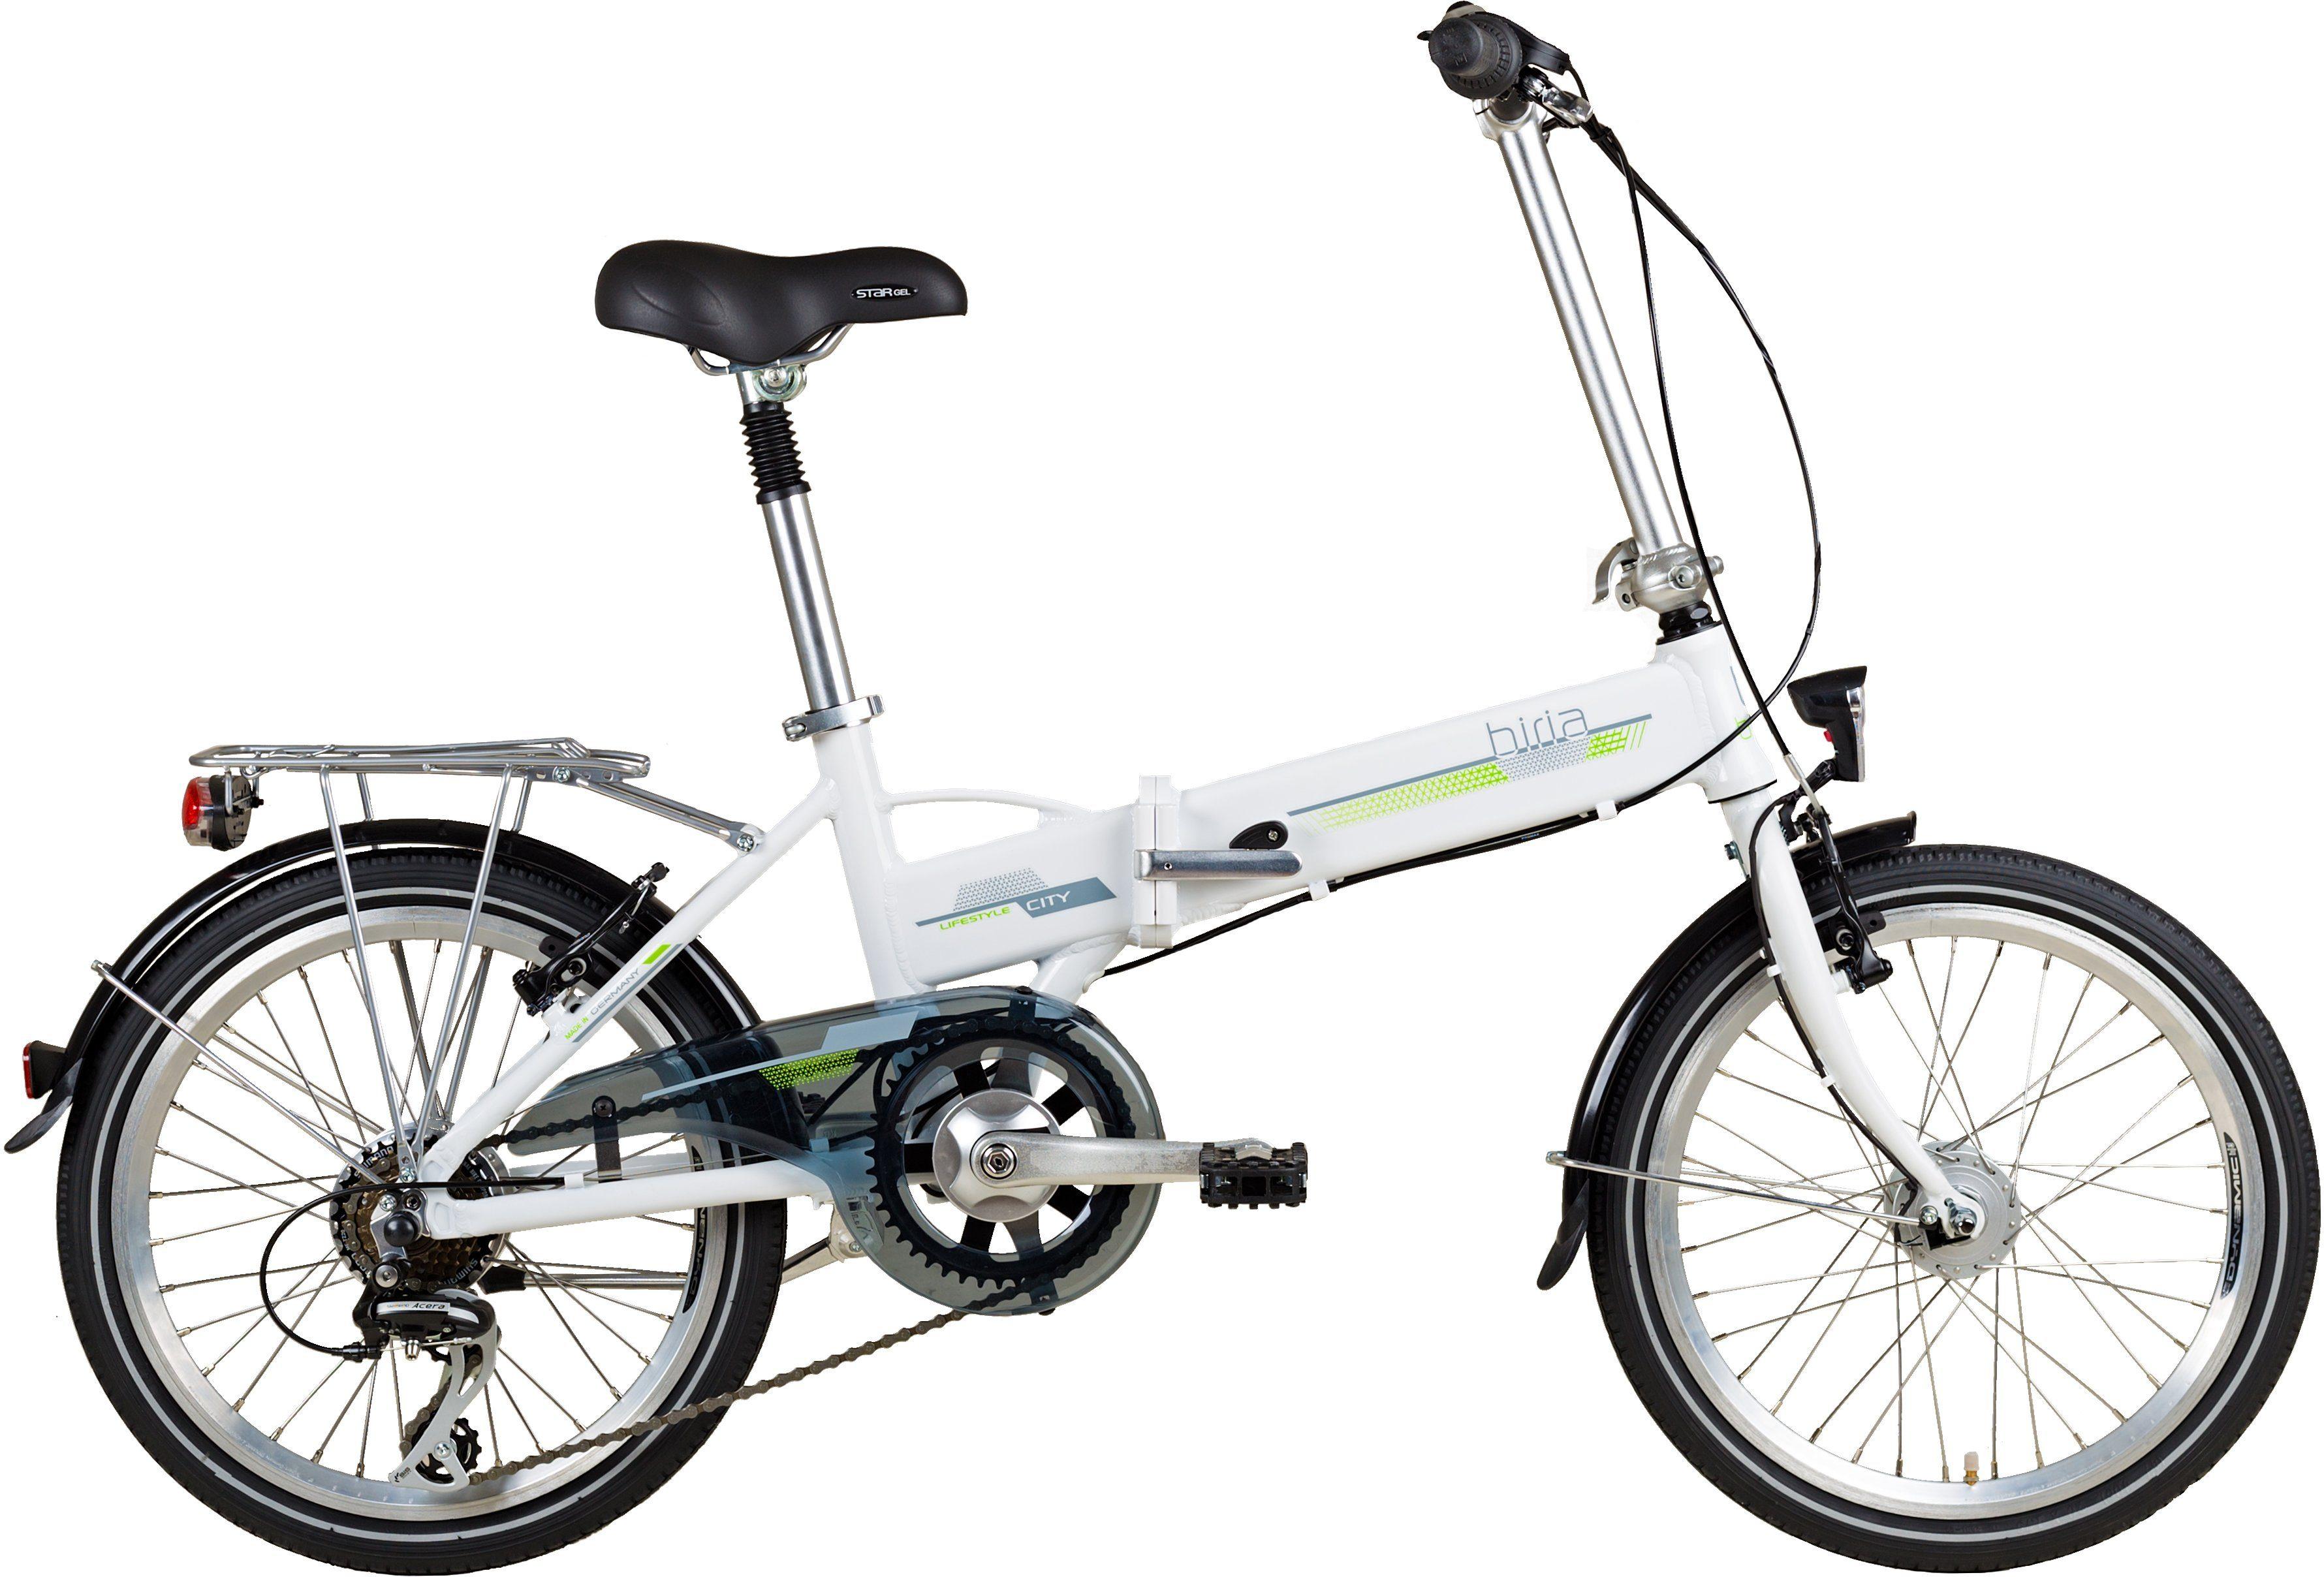 Biria E-Bike Faltrad, 20 Zoll, 6-Gang Shimano Acera, V-Brake, Hinterradmotor 250 W, 24V/ 7Ah